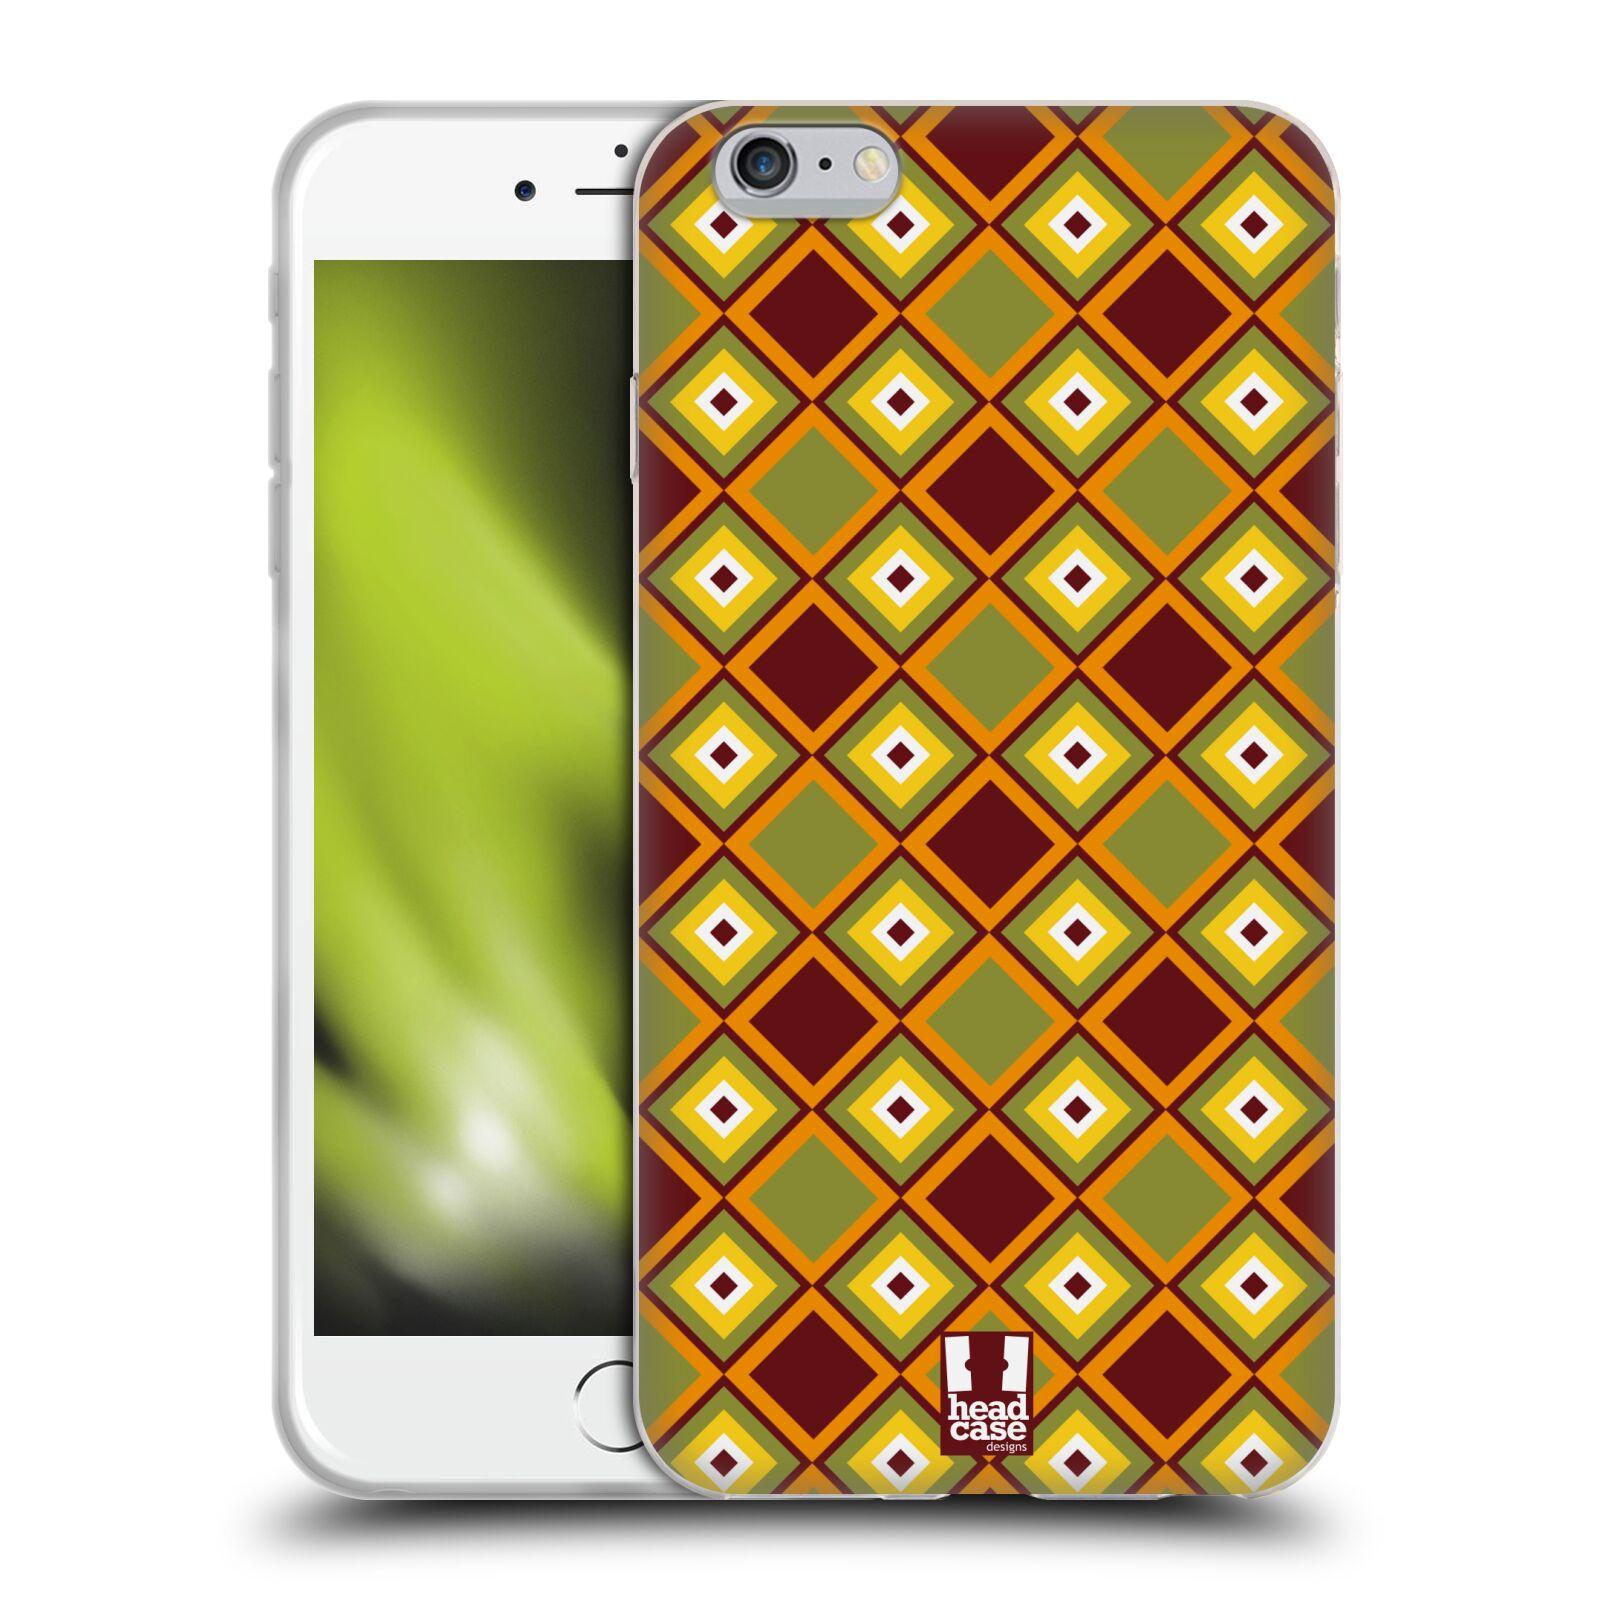 HEAD CASE silikonový obal na mobil Apple Iphone 6 PLUS/ 6S PLUS vzor Africké motivy DIAMANT